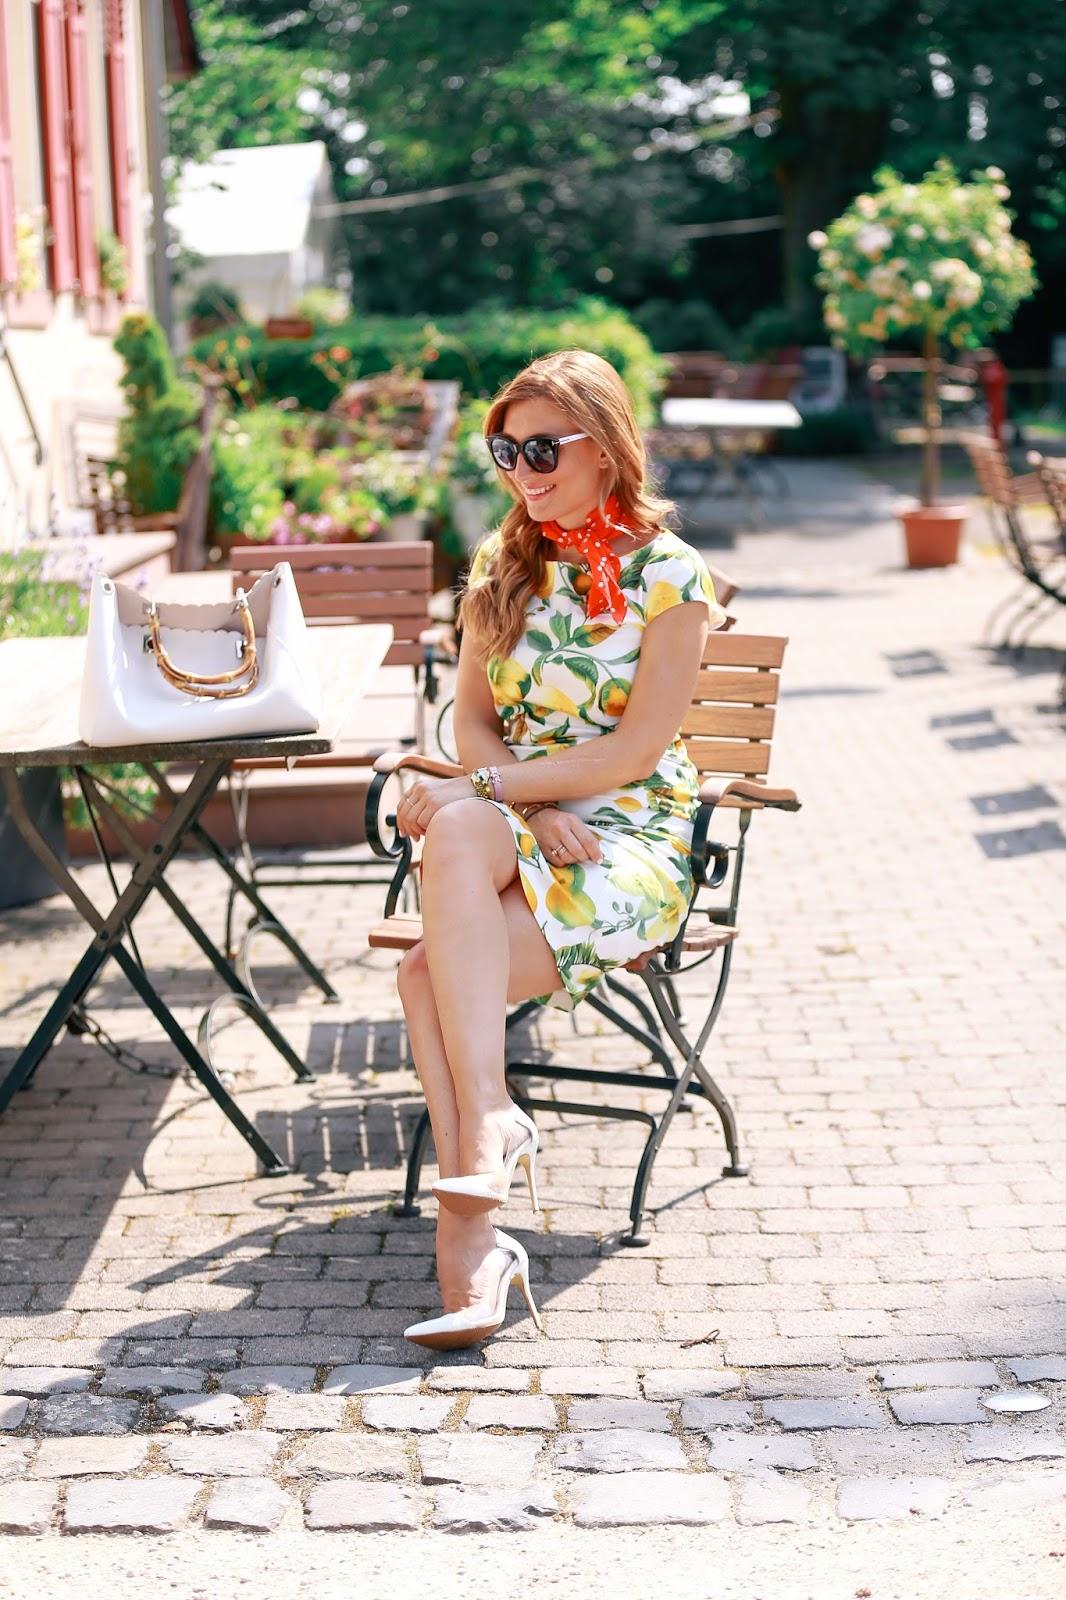 kleid-mit-zitronenprint-obstprint-business-kleid-fashionblogger-sommer-style